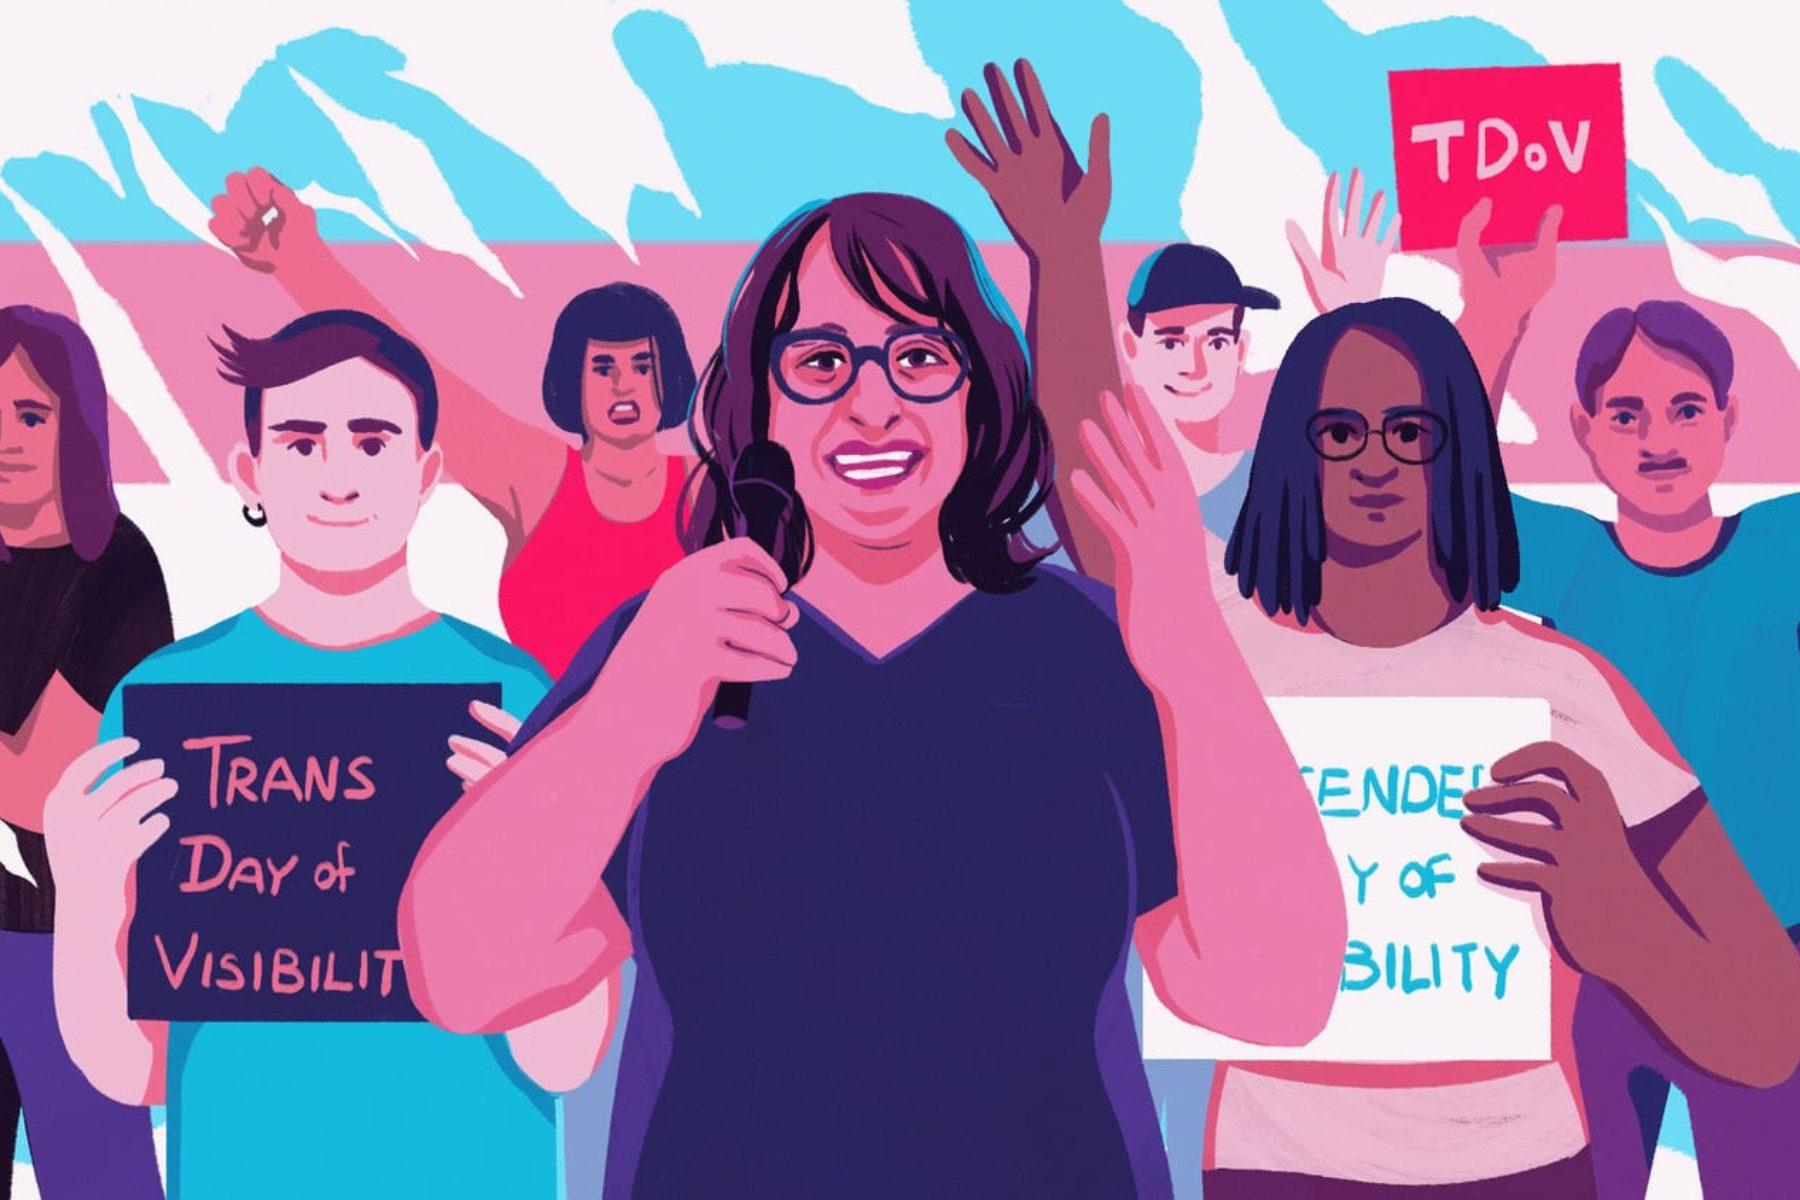 Rachel Crandell-Crocker on Trans Visibility Day.